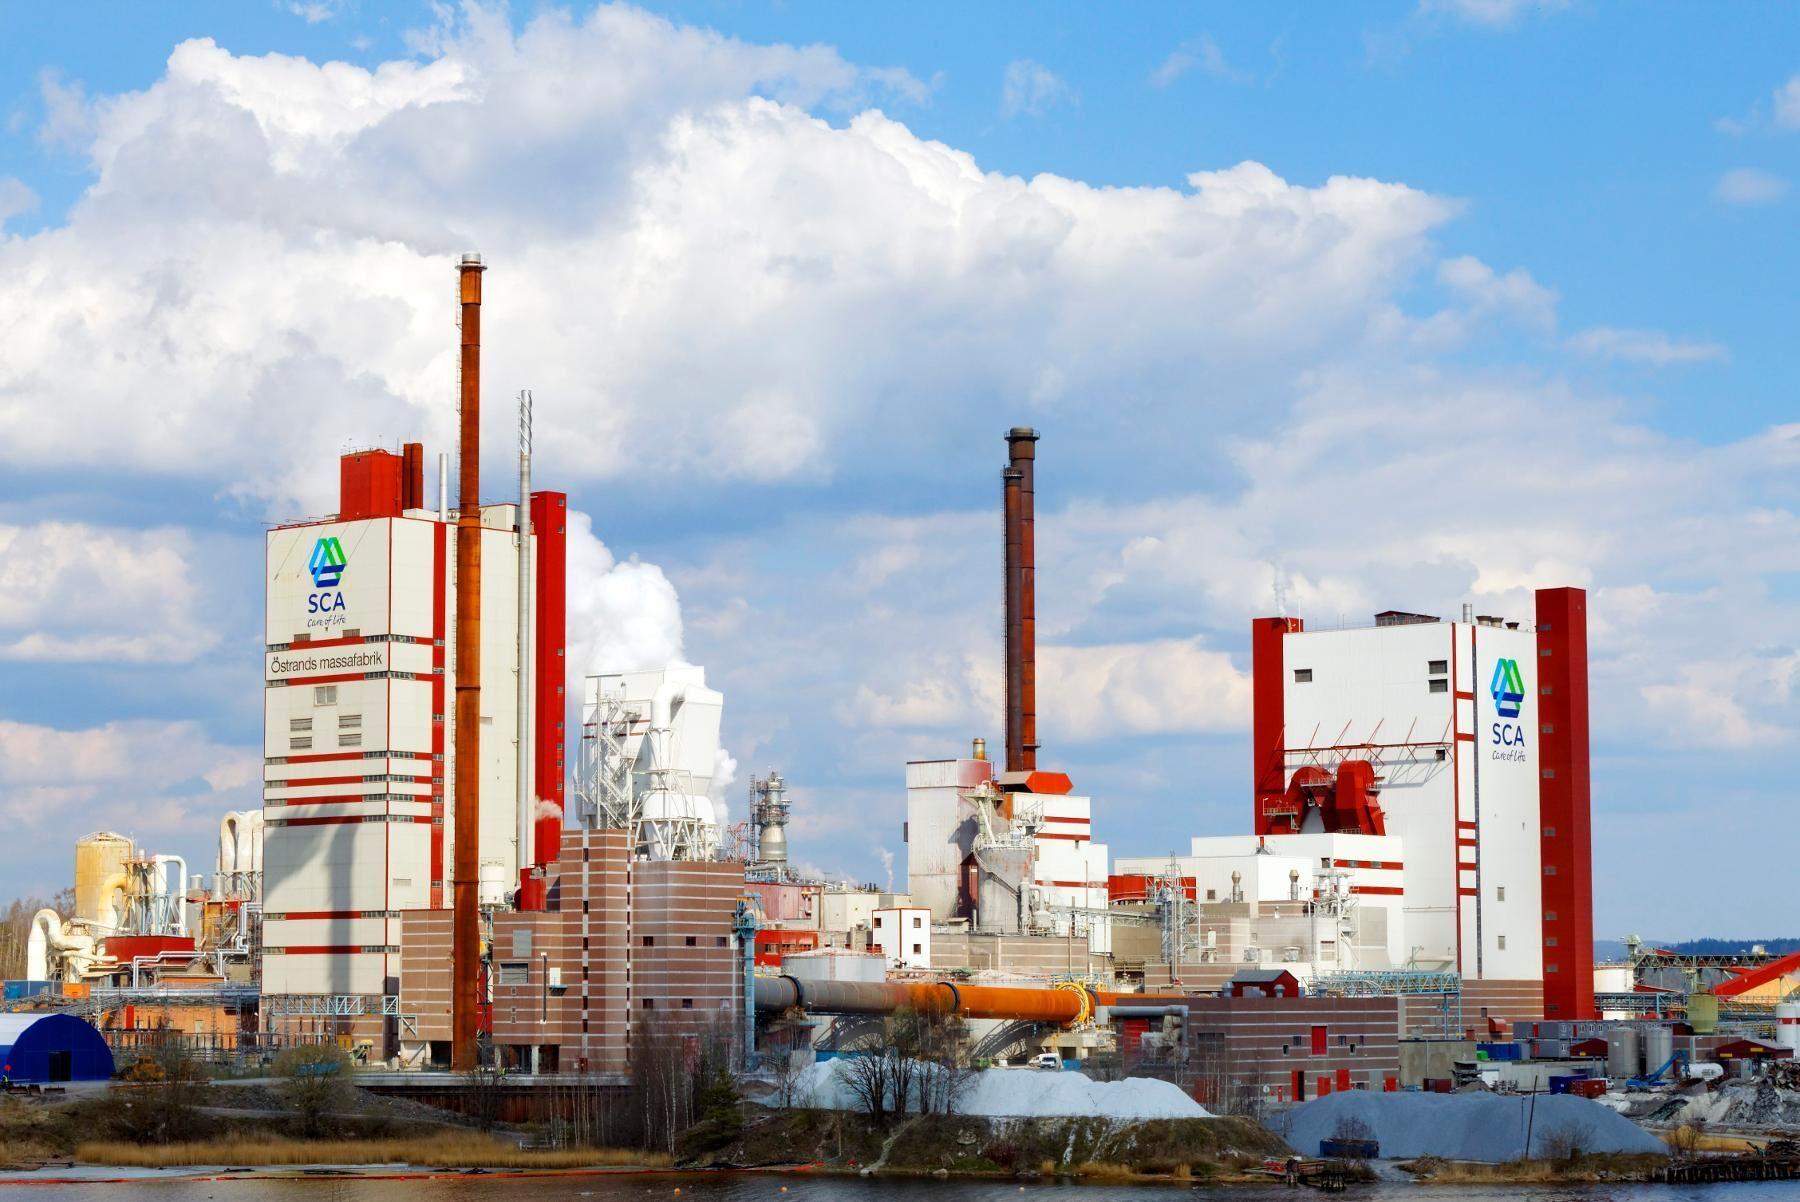 Produktionsstoppet på Östrand i juli påverkade resultatet negativt.